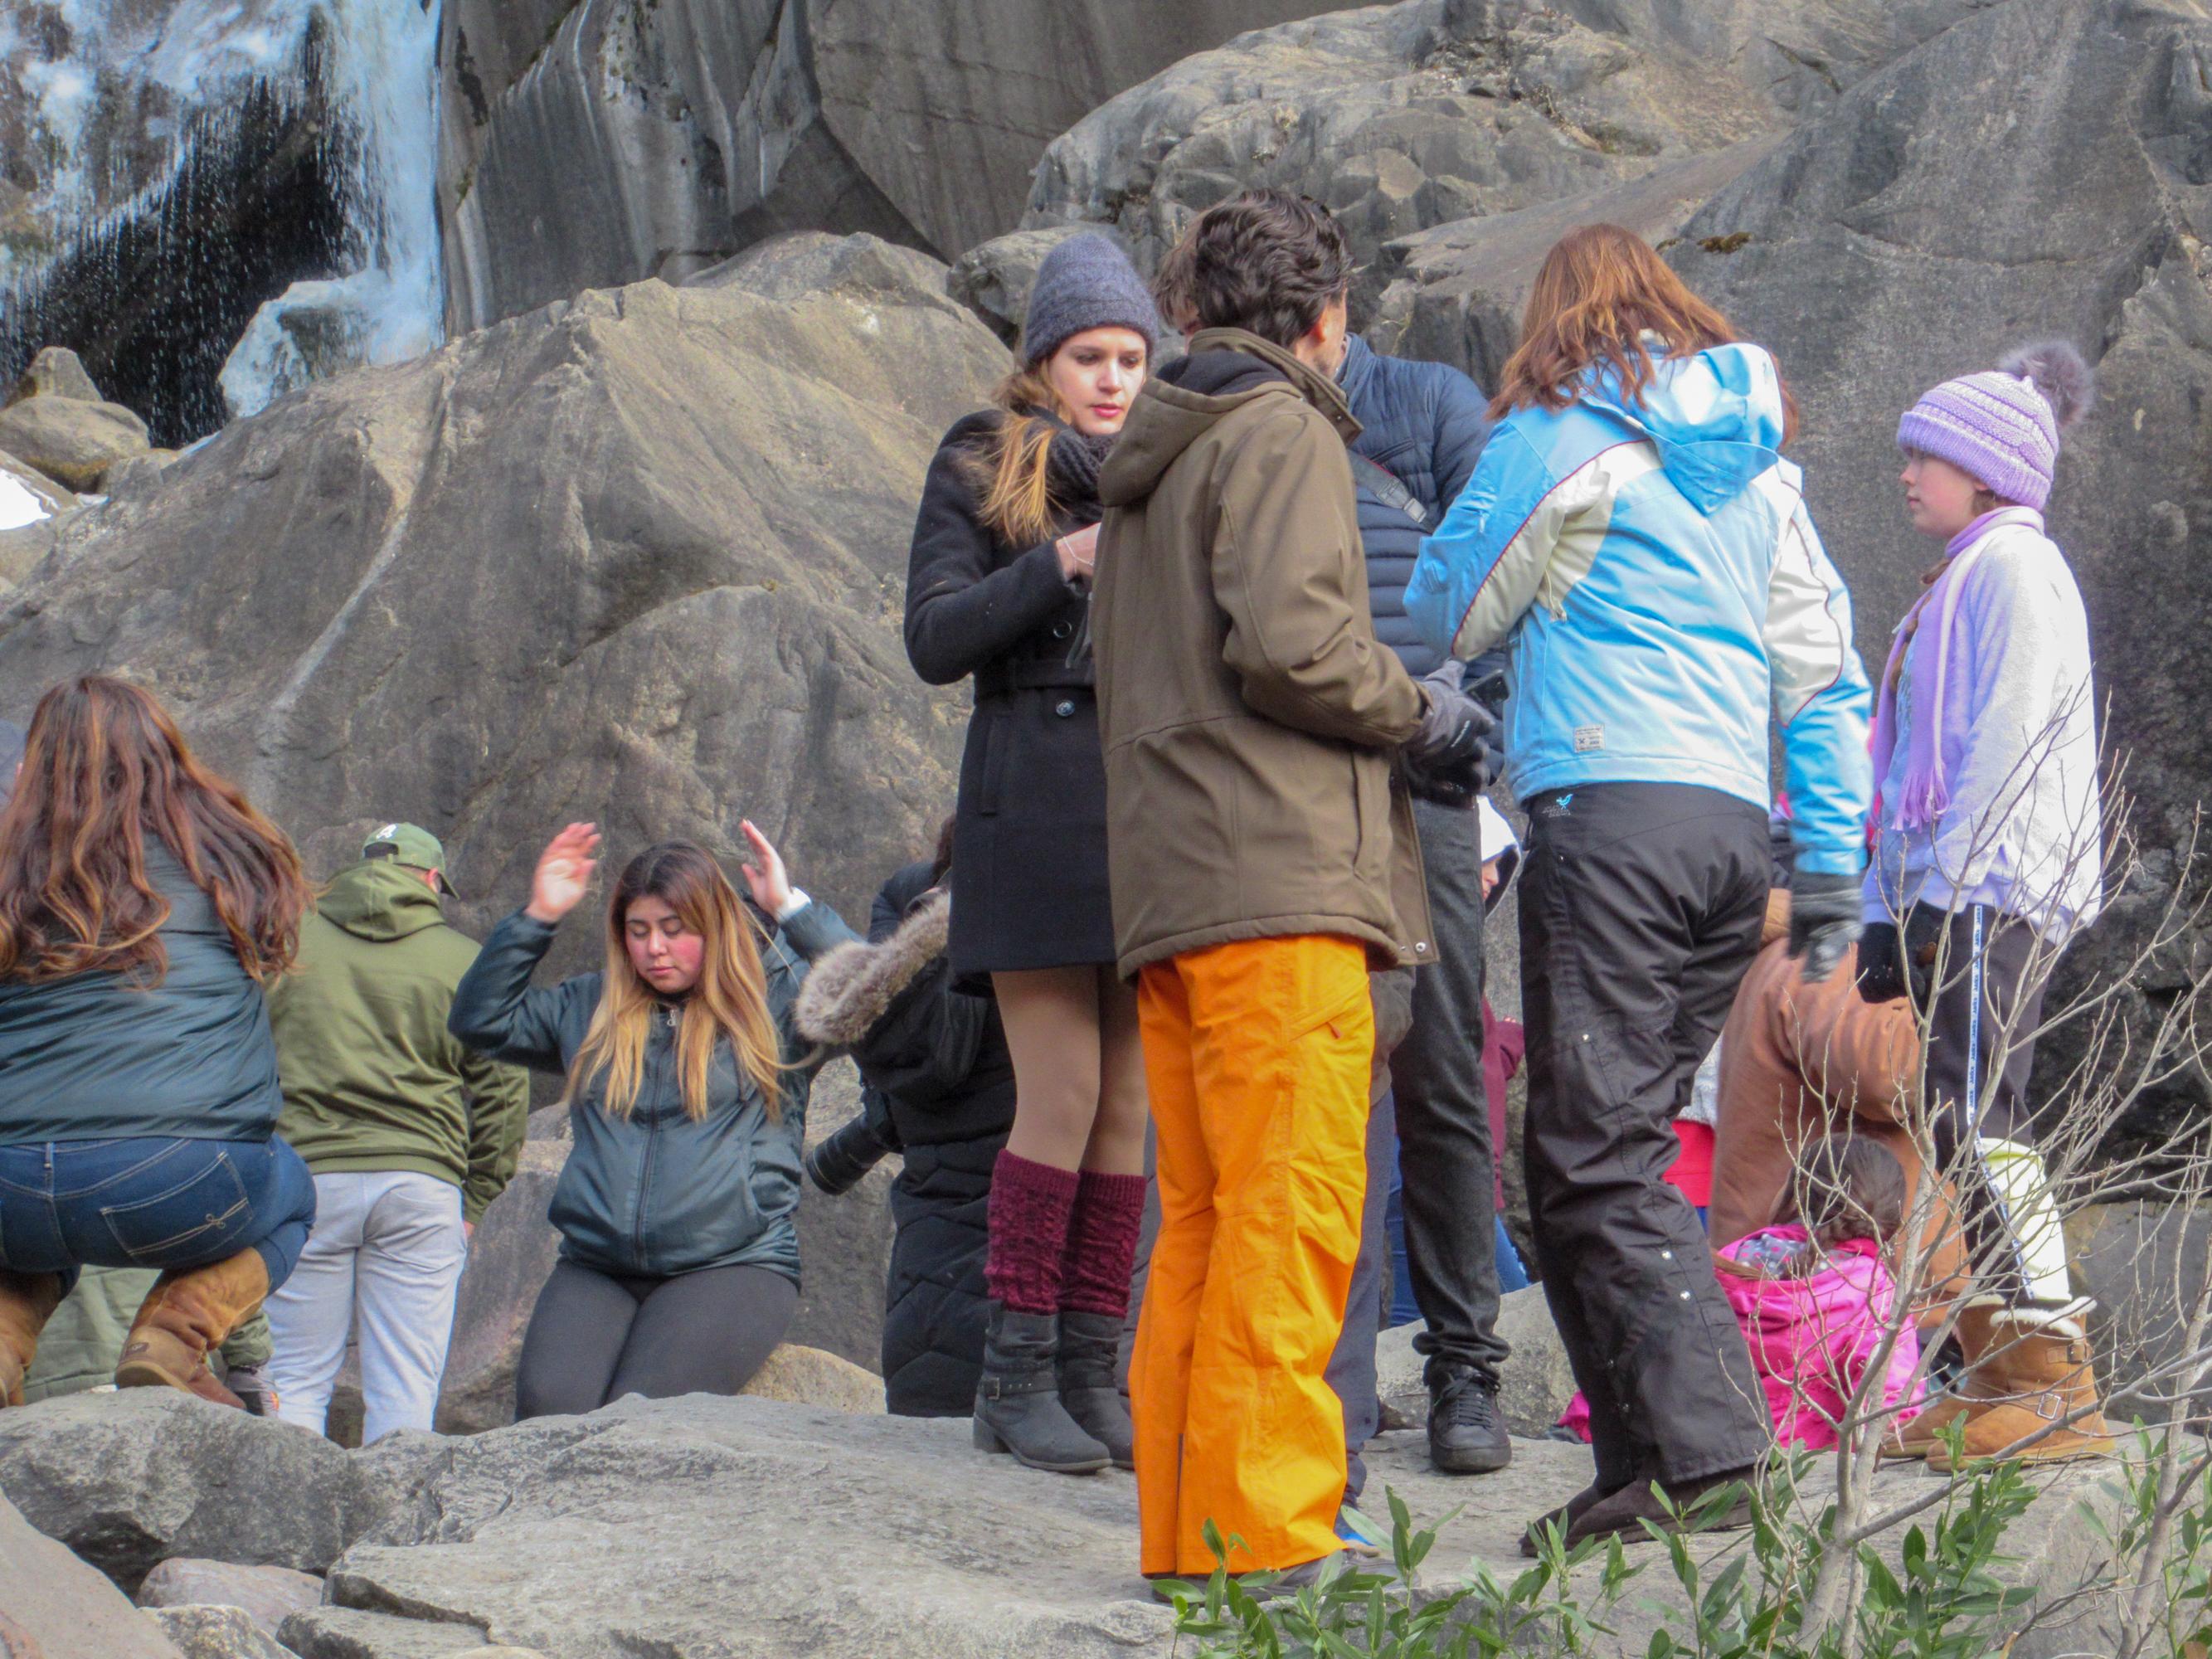 Tourists climb on rocks at the base of bridalveil falls.